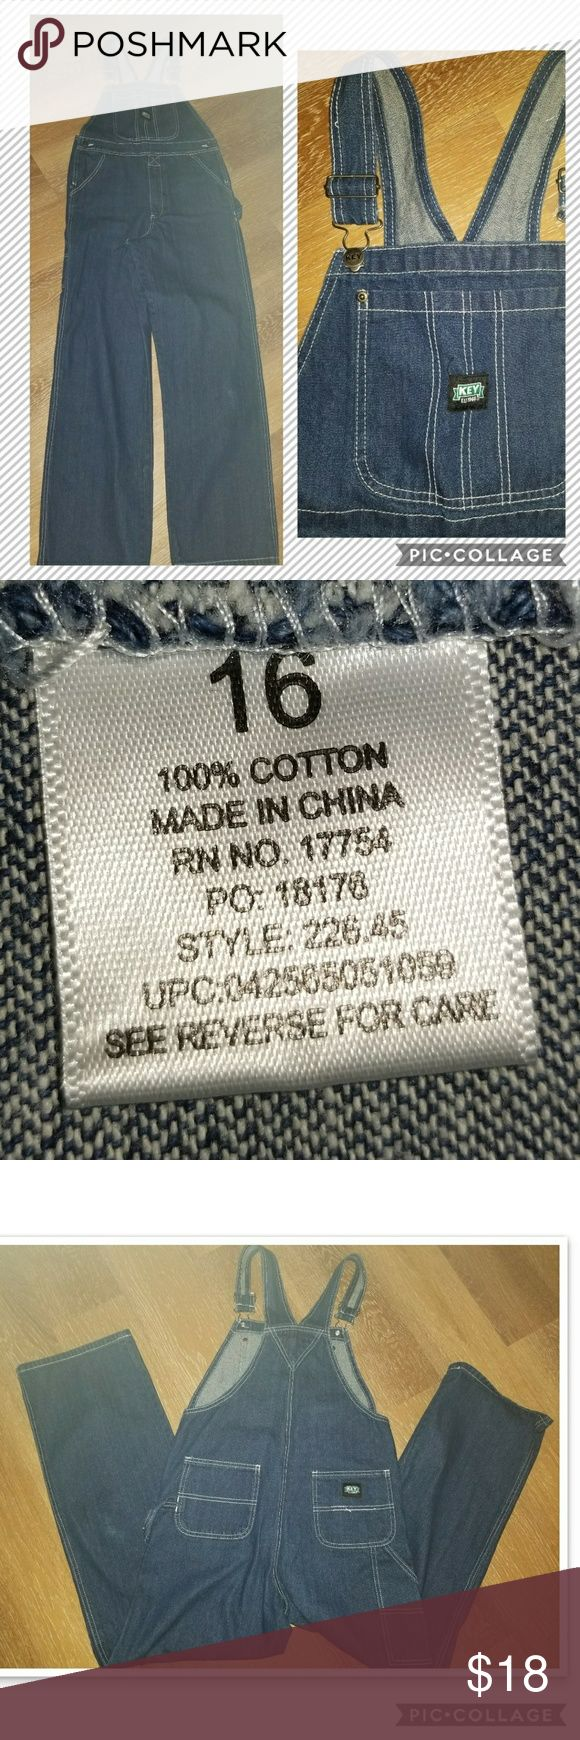 Boy's KEY Denim Overalls Sz 16 Like New, little wear, KEY denim bib overalls.  100% Cotton. Key Bottoms Overalls